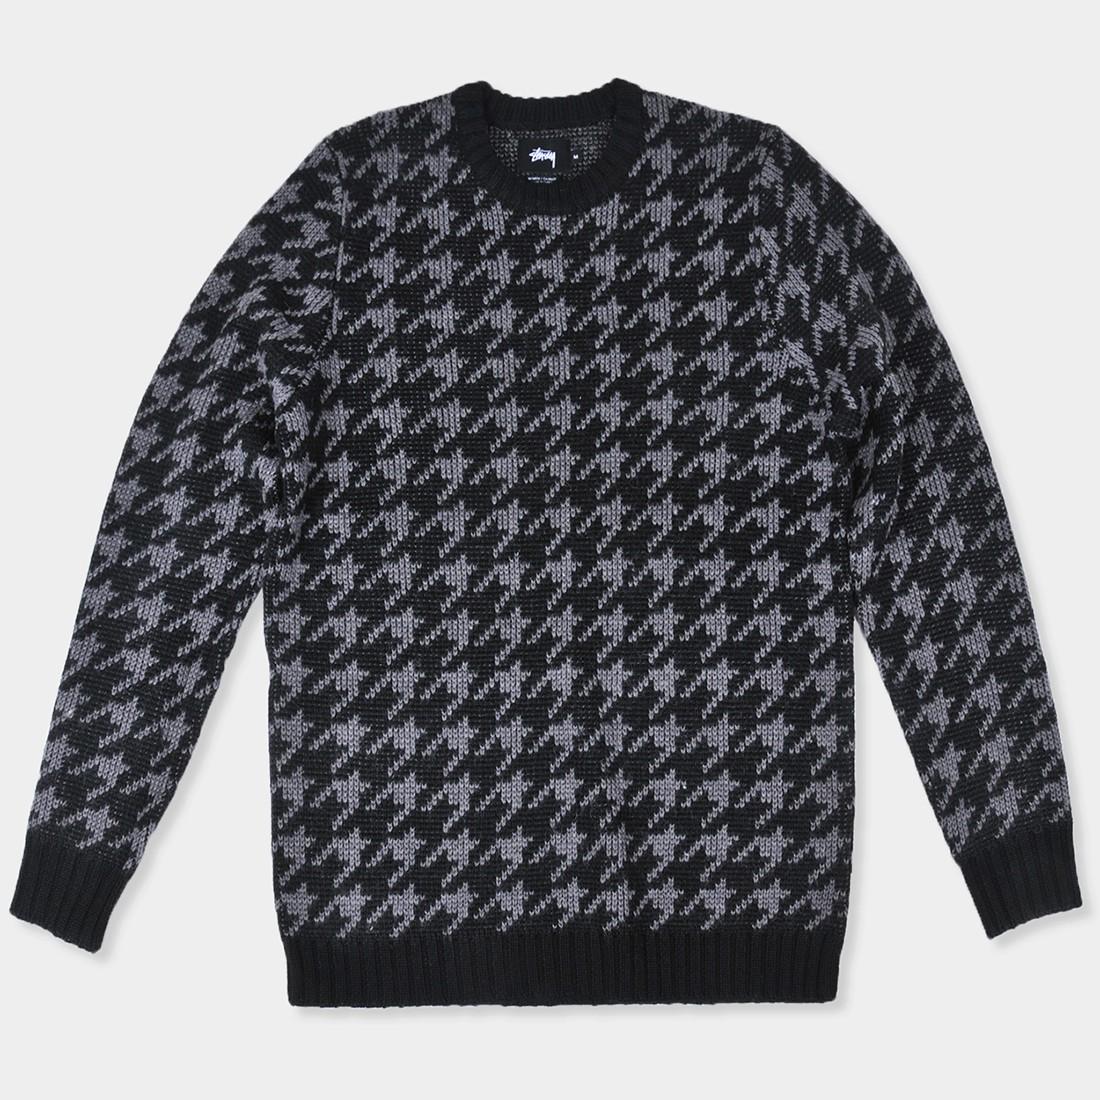 Buy Stussy Men S Sweaters Stussy Houndstooth Sweater Black